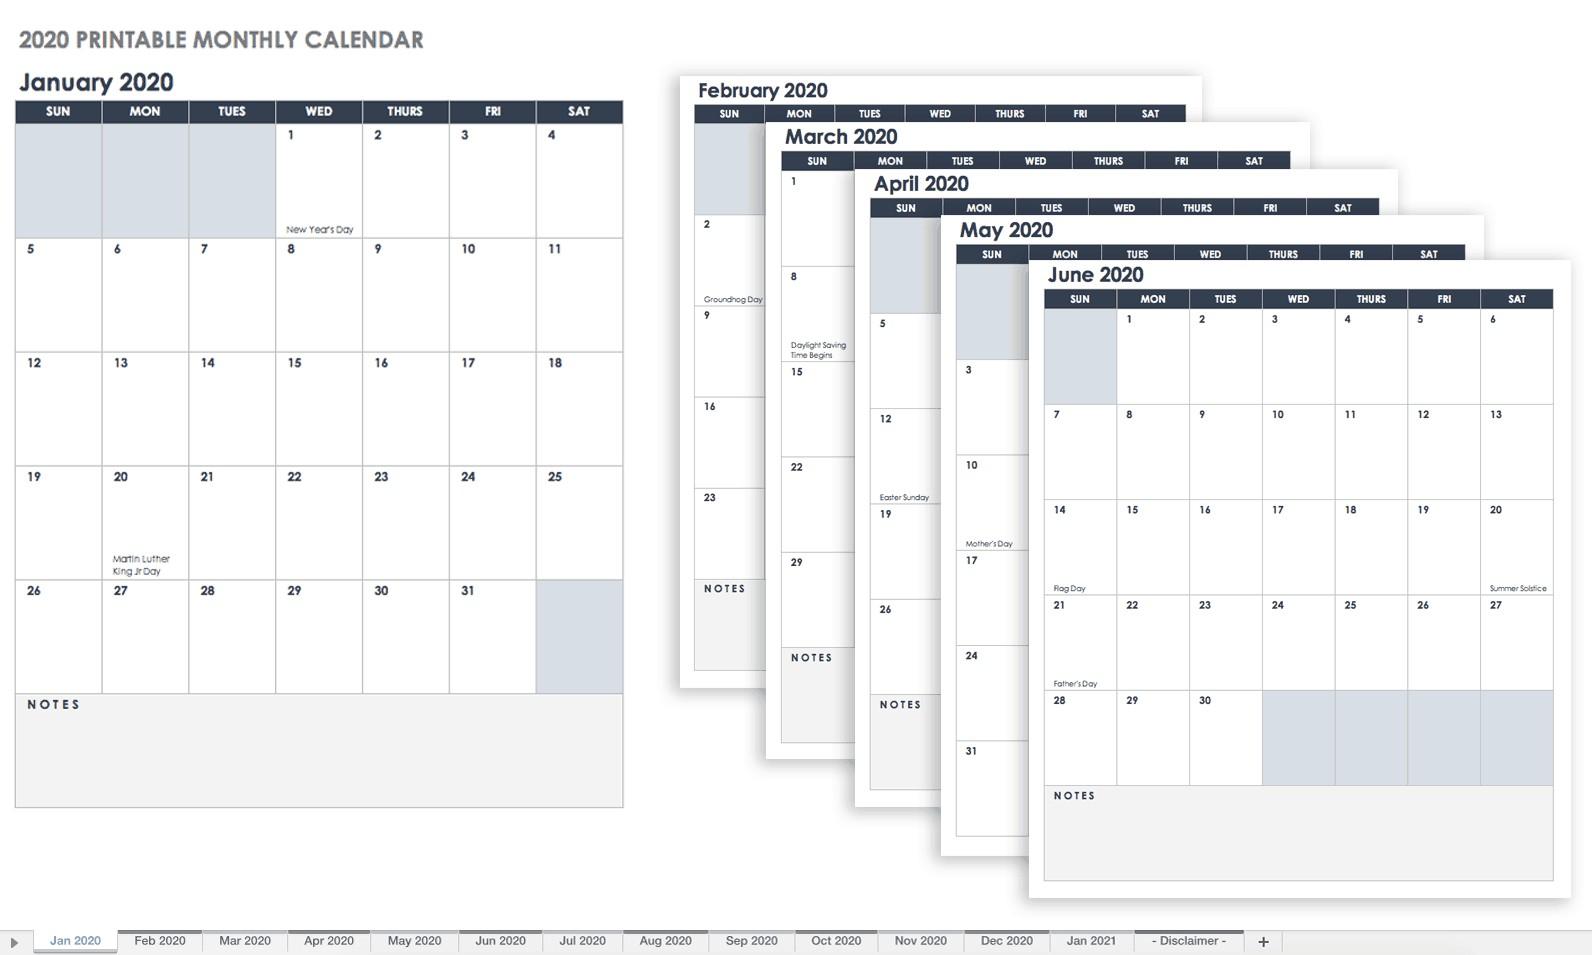 Monthly Printable Calendar 2020 15 Free Monthly Calendar Templates